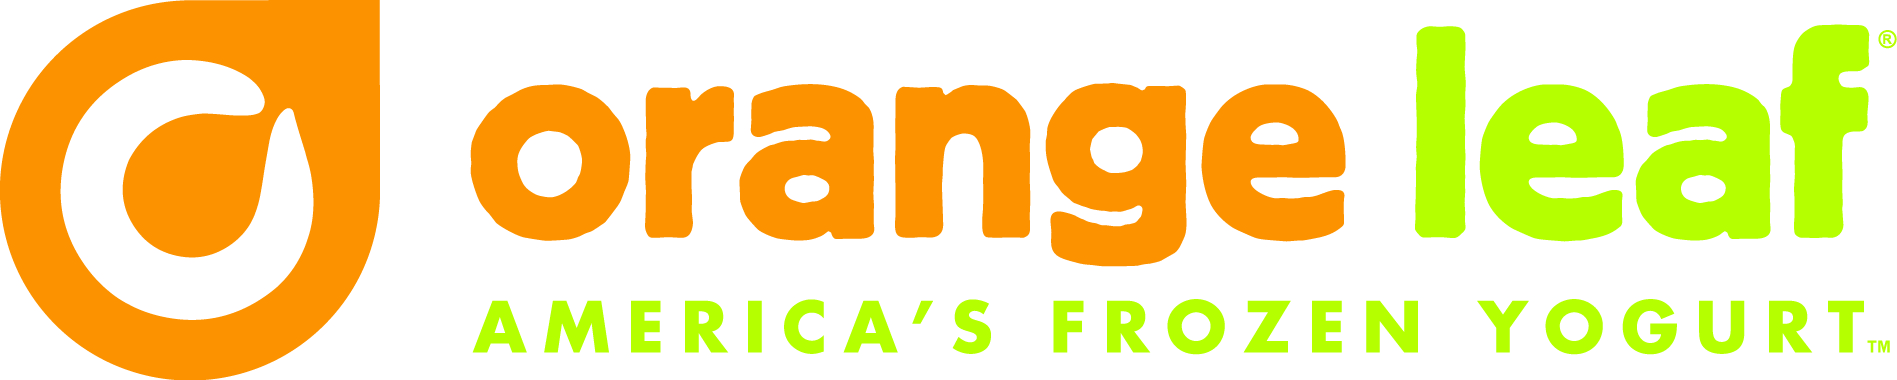 orangeleaf.jpg